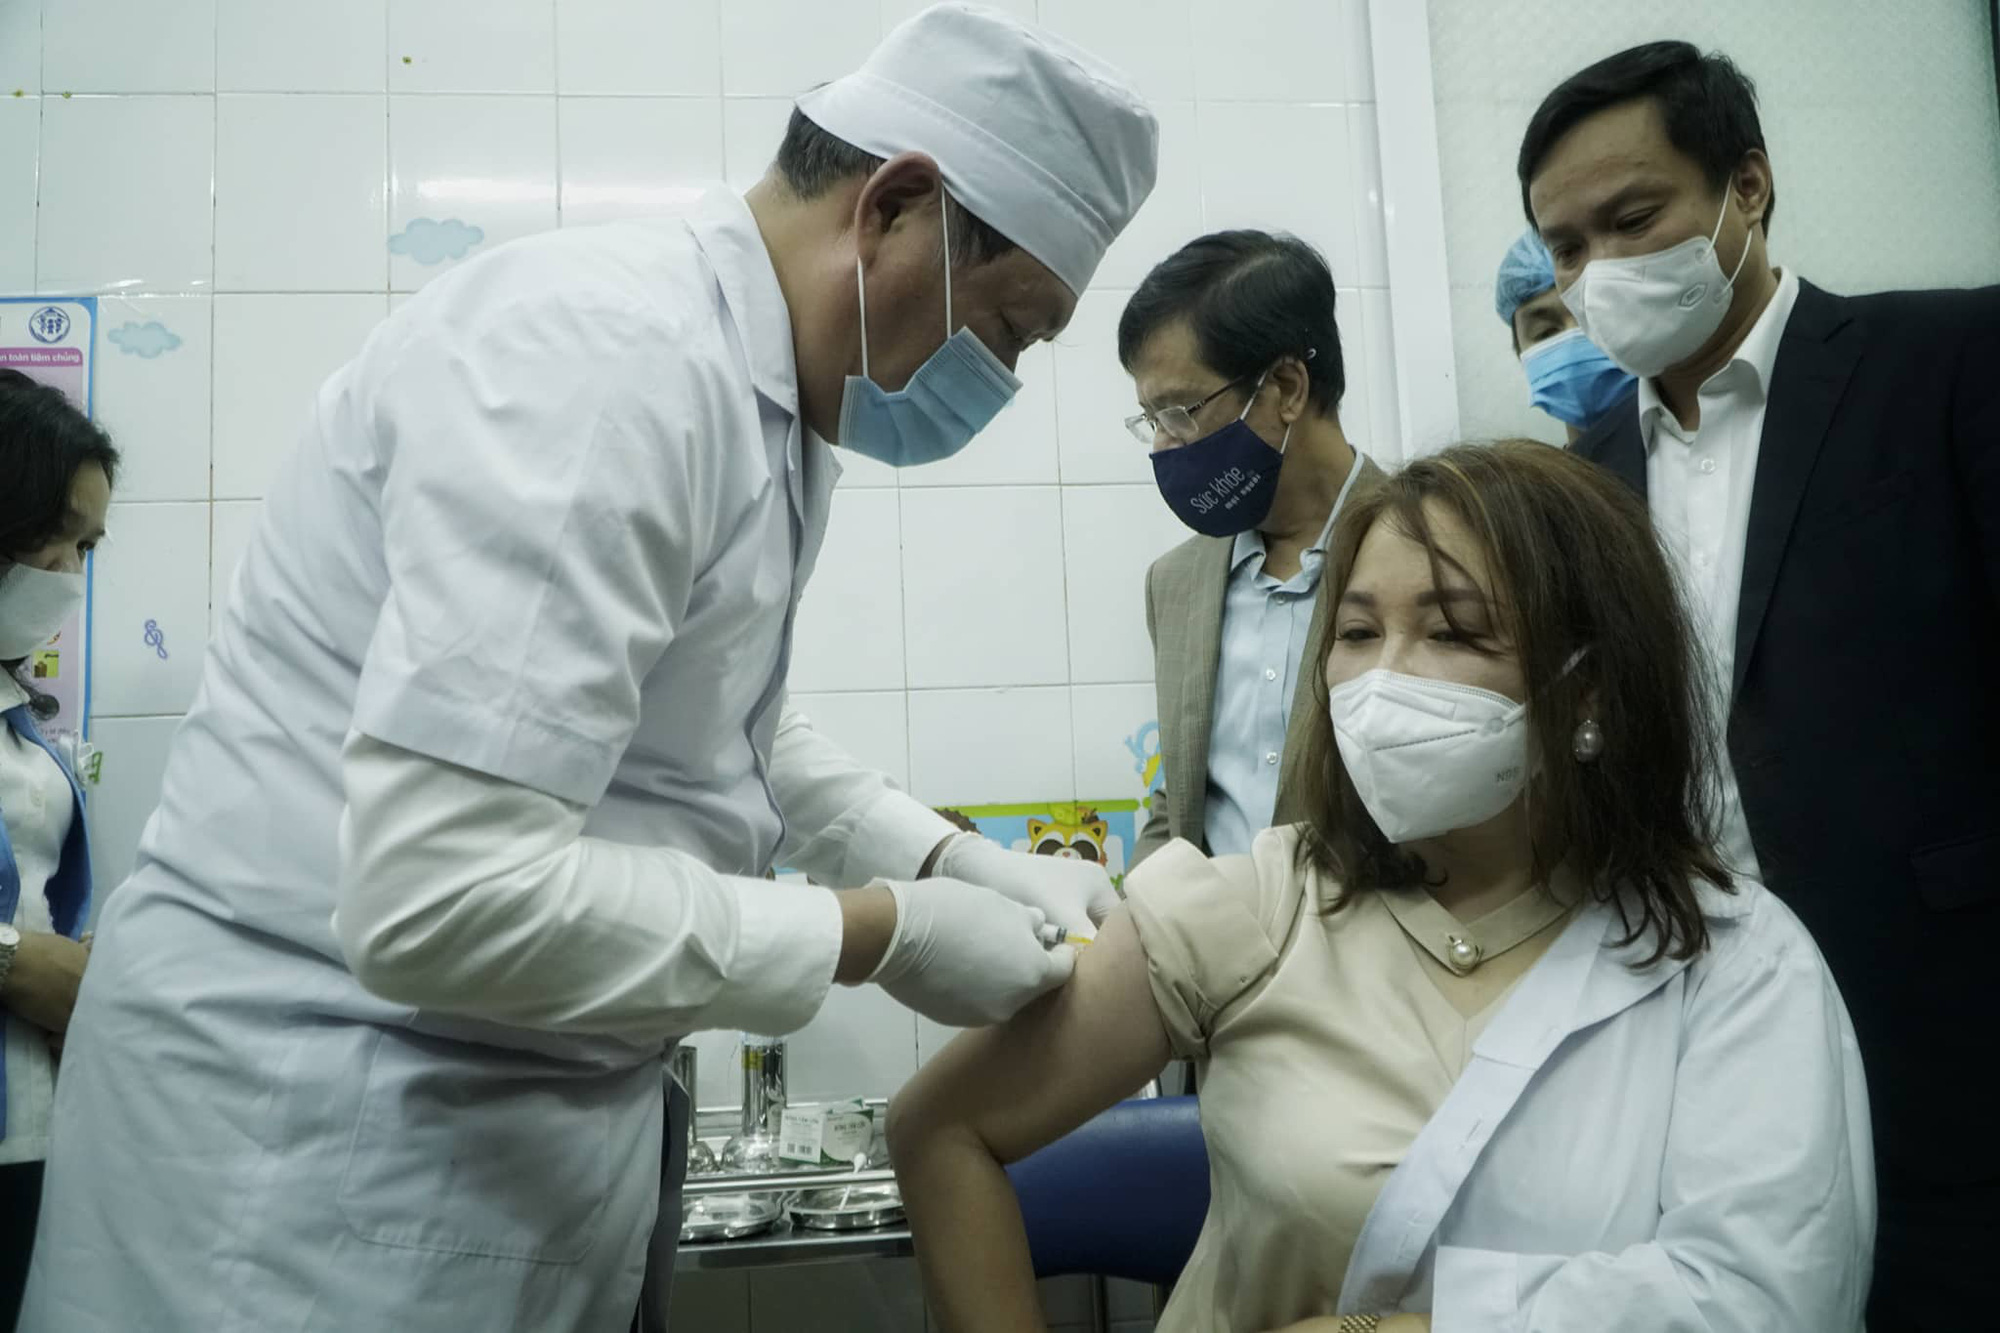 Deputy Minister of Health Do Xuan Tuyen vaccinates an employee of the medical center in Hai Duong City, Hai Duong Province, Vietnam, March 8, 2021. Photo: Pham Tuan / Tuoi Tre